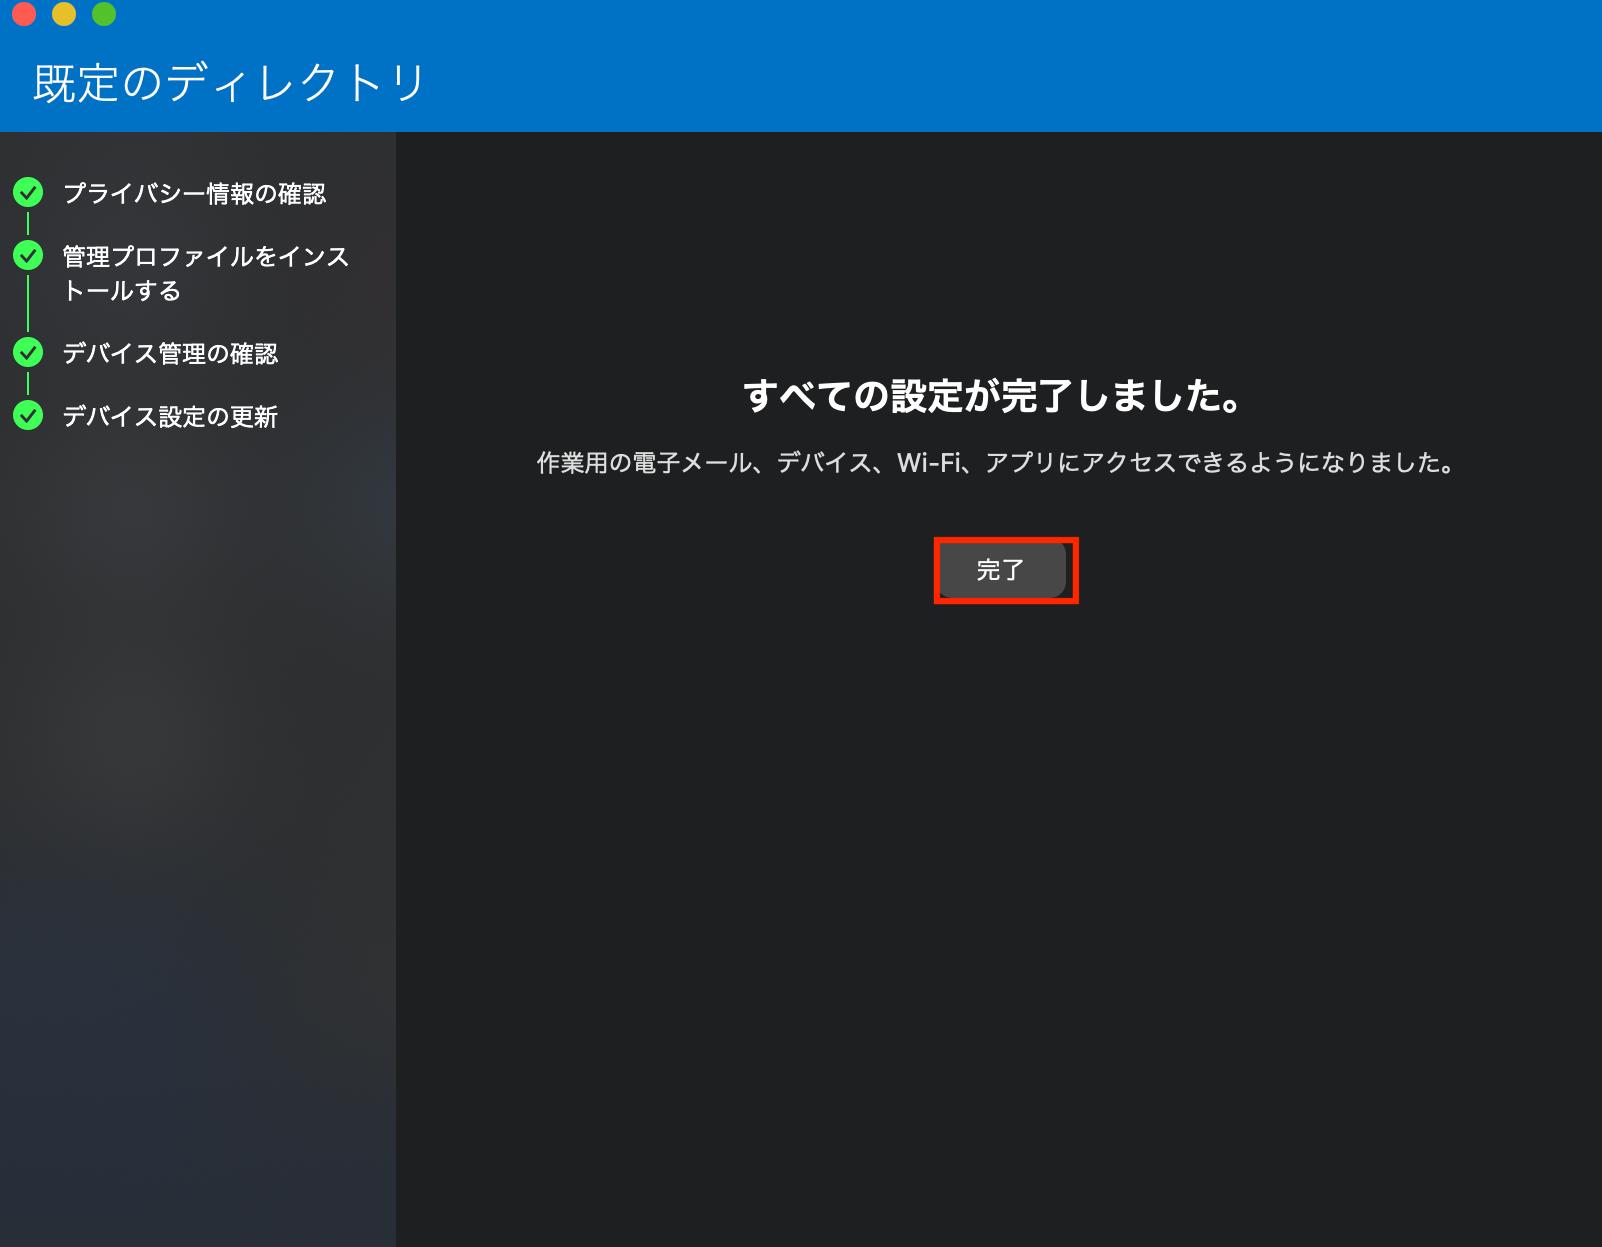 portal_site_11.png